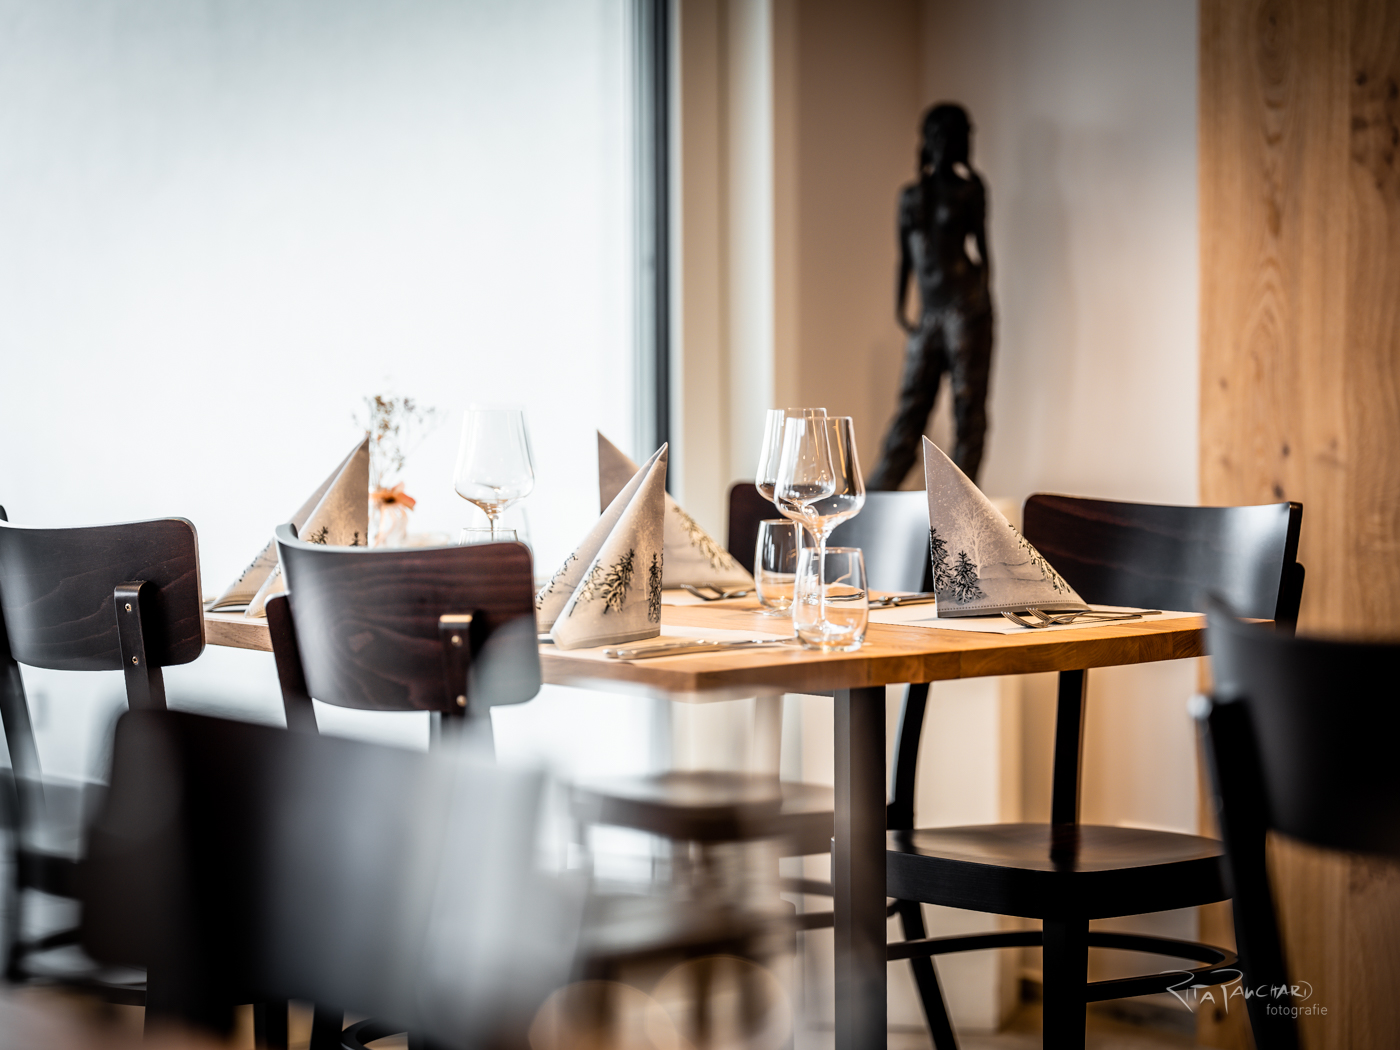 restaurantfotografie_gastrofotografie-5031.jpg